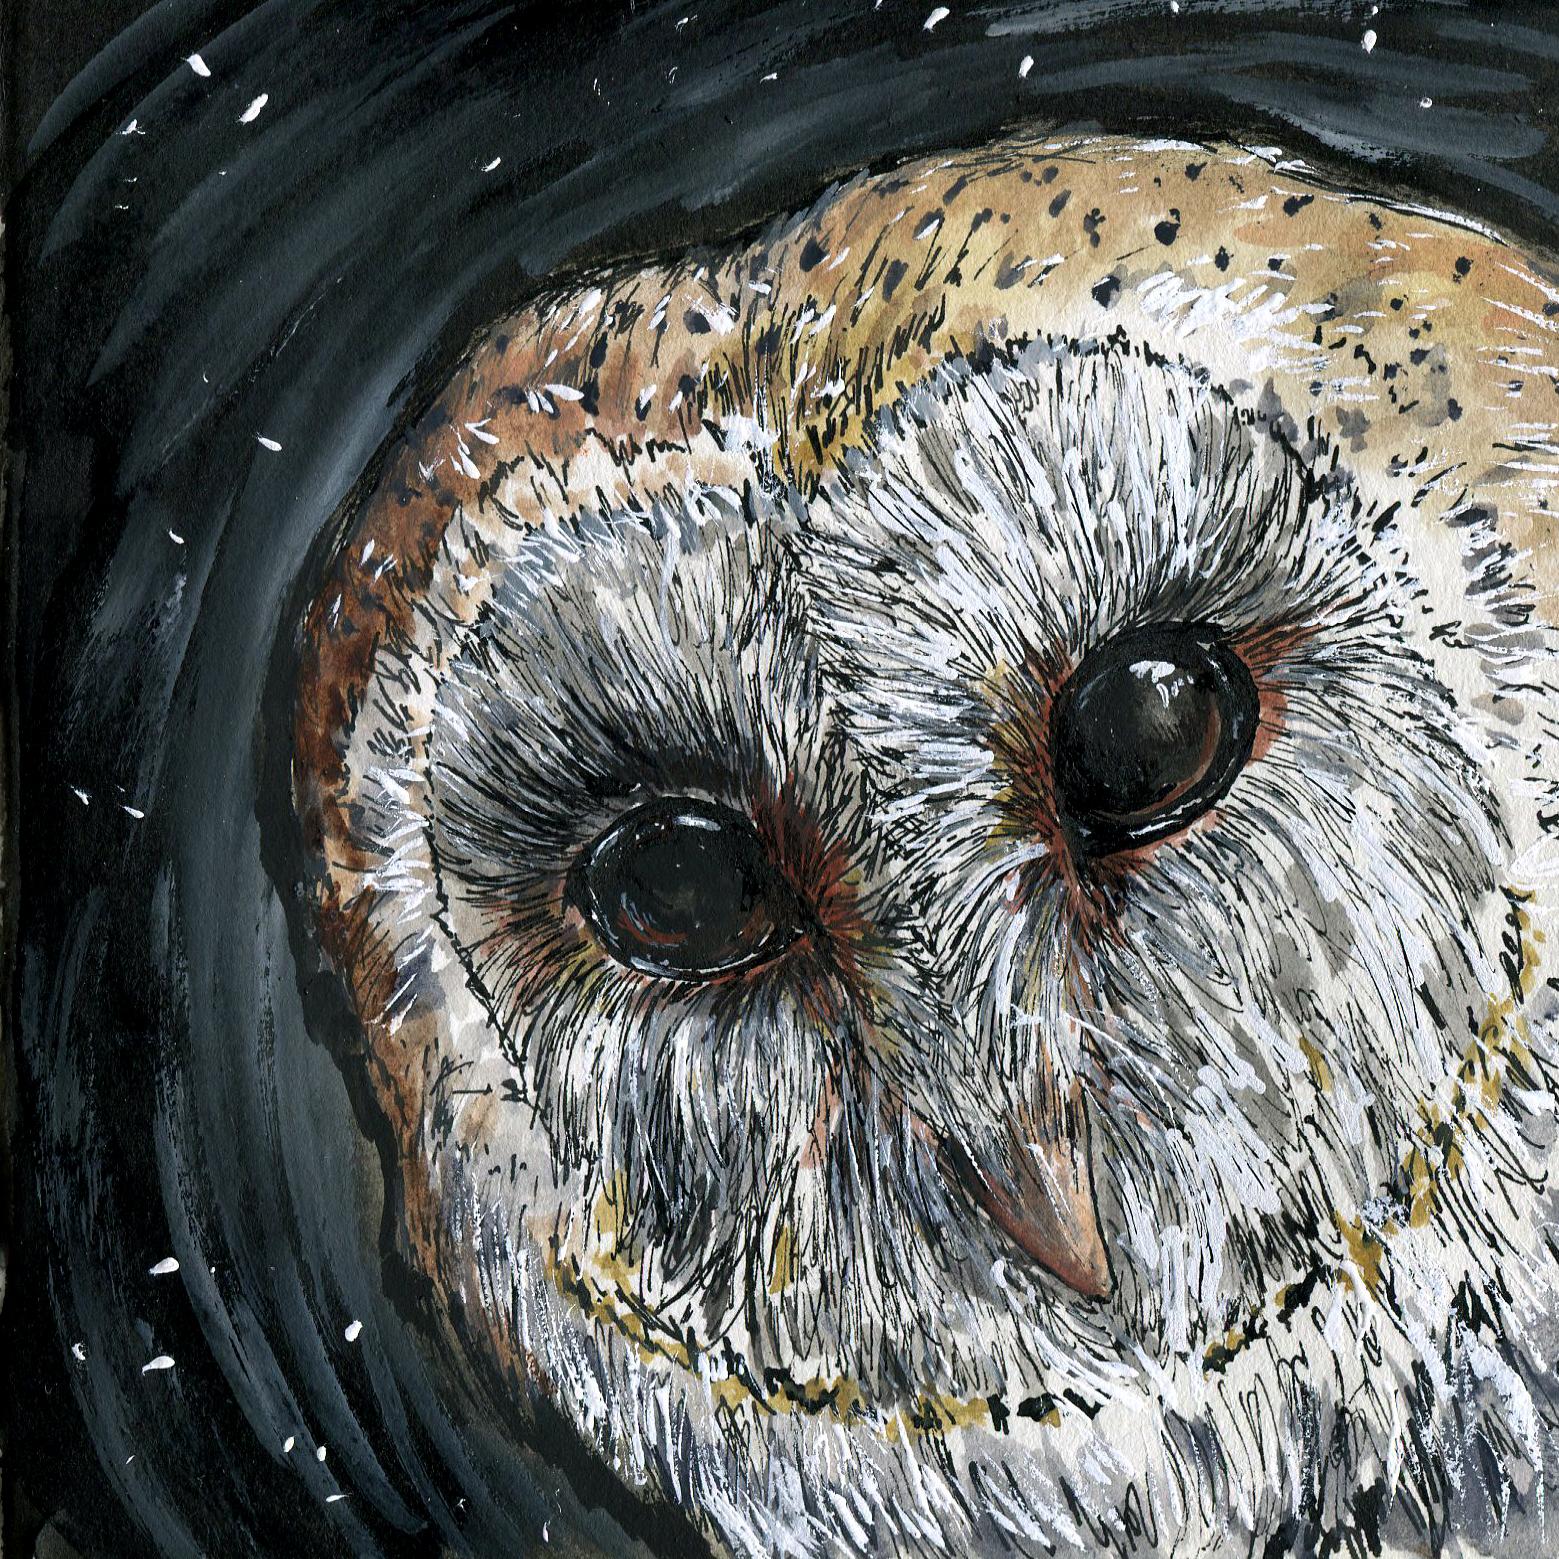 324. Barn Owl